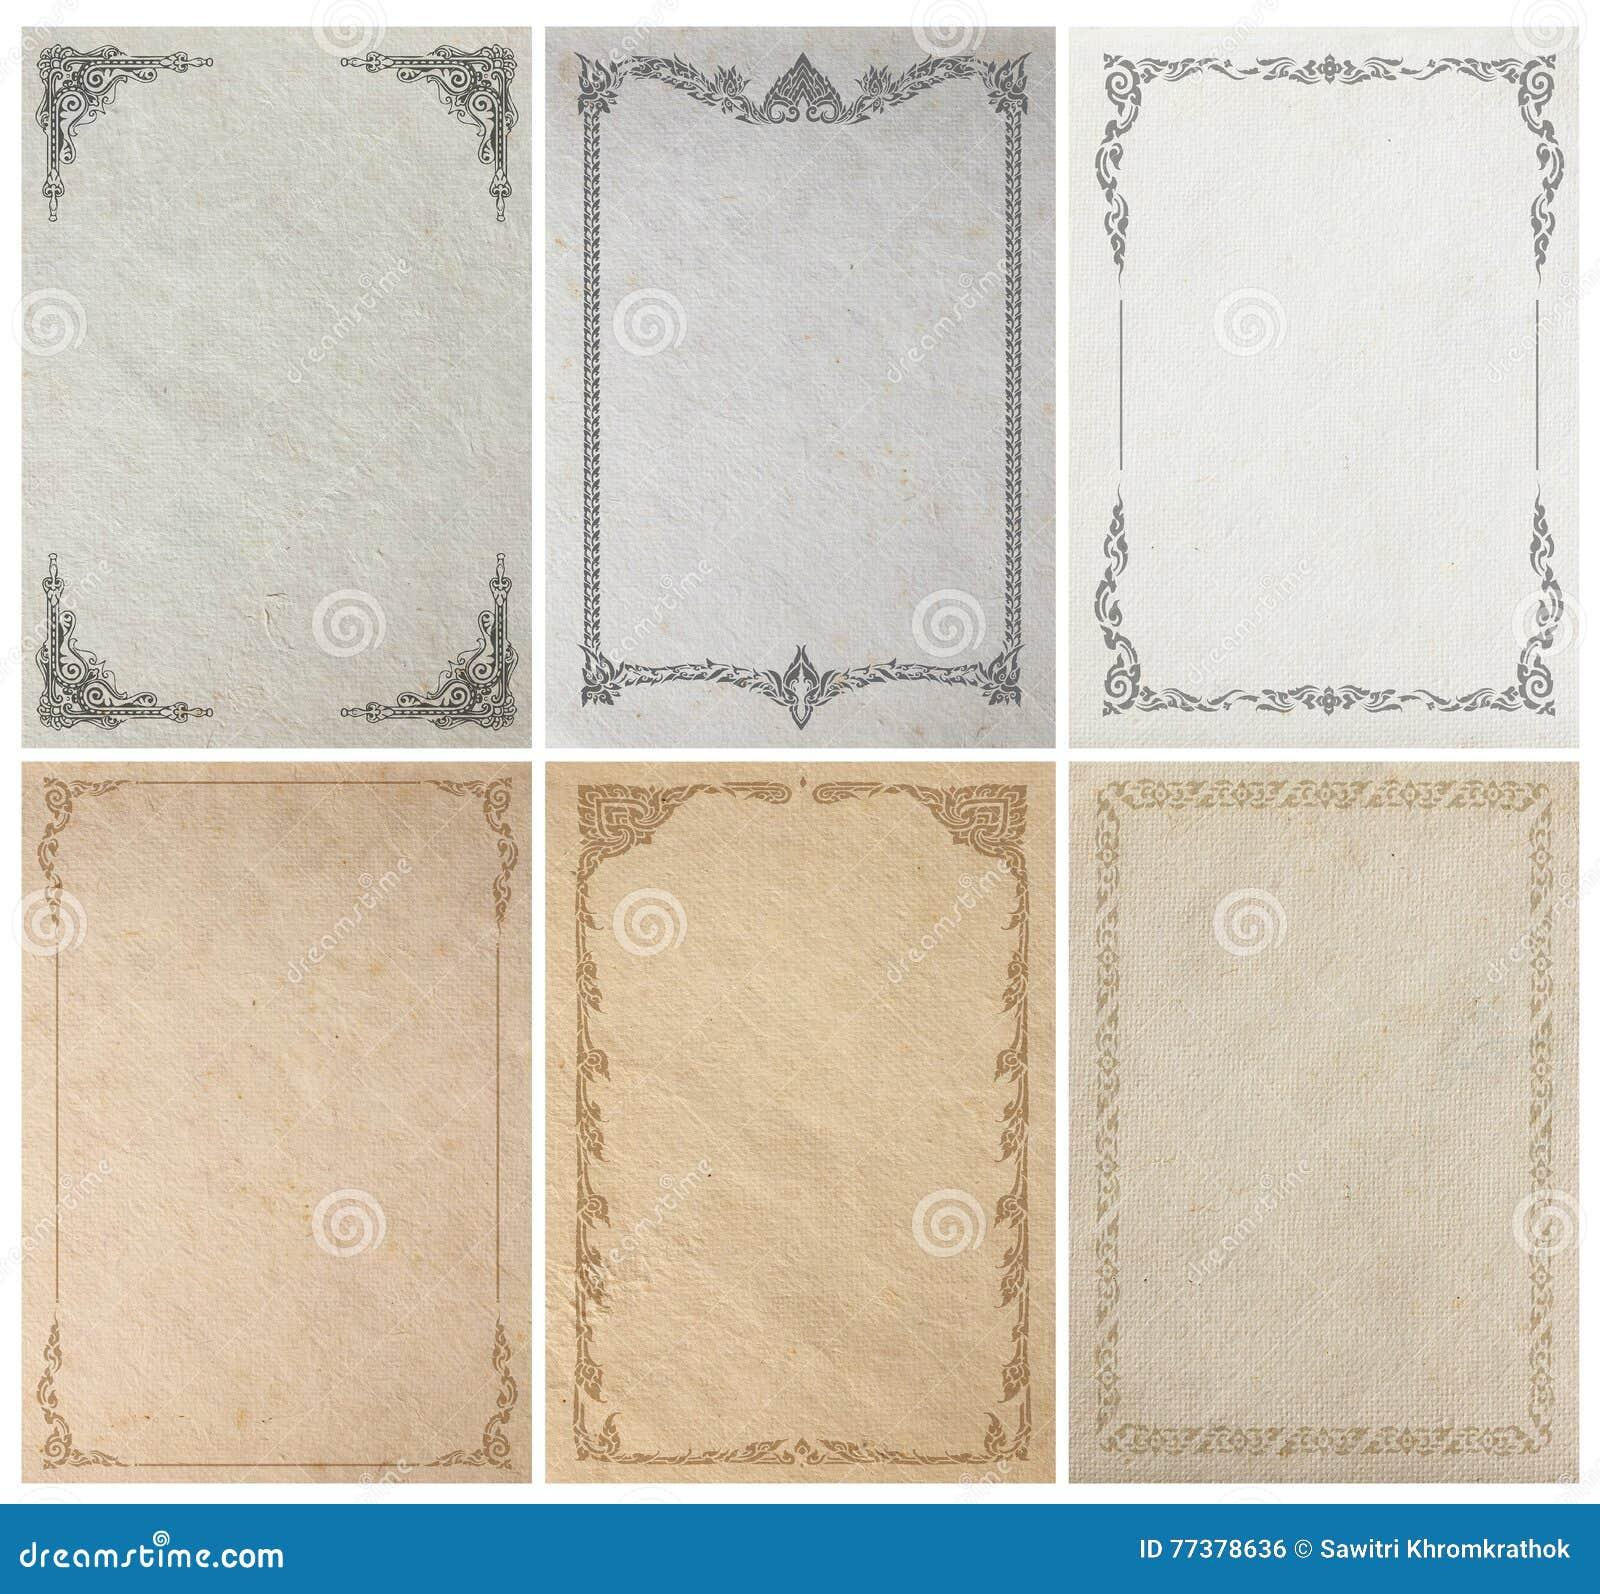 Old paper background texture with vintage frame border